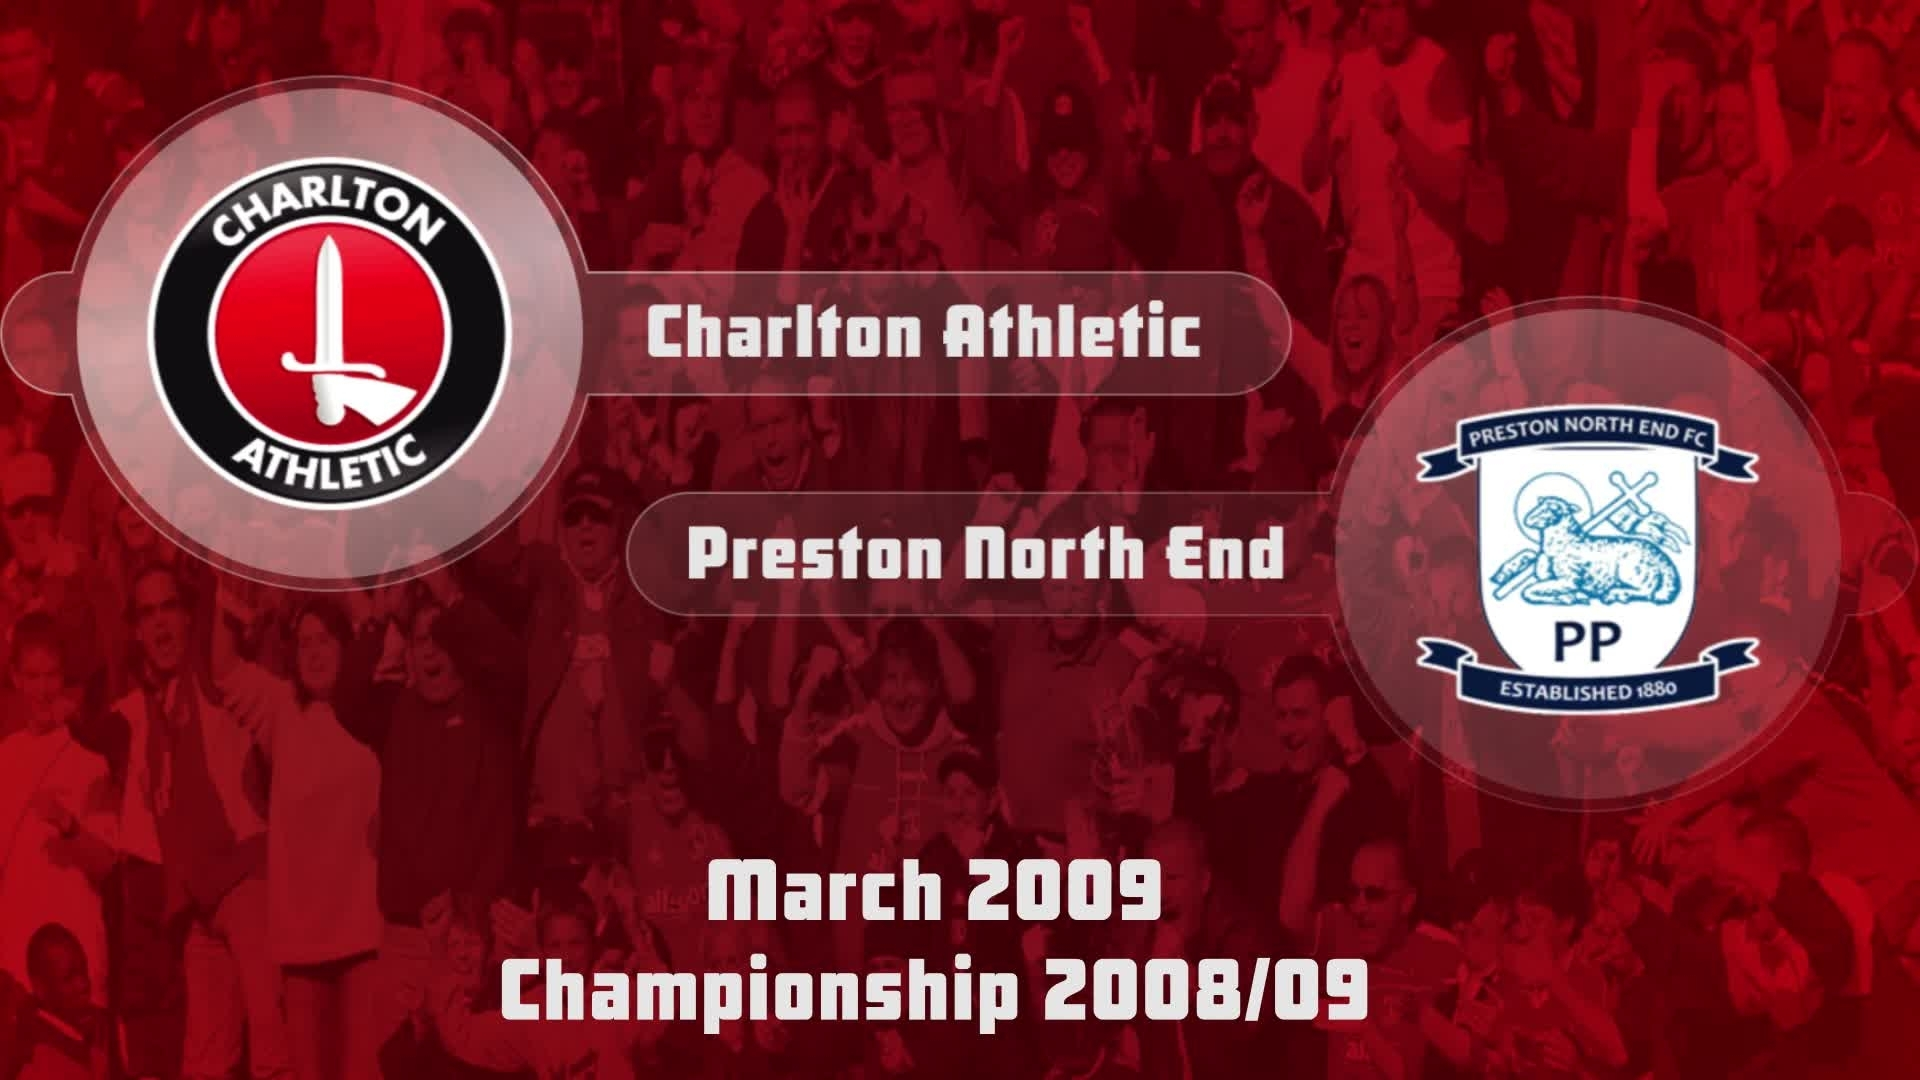 43 HIGHLIGHTS | Charlton 0 Preston North End 0 (March 2009)